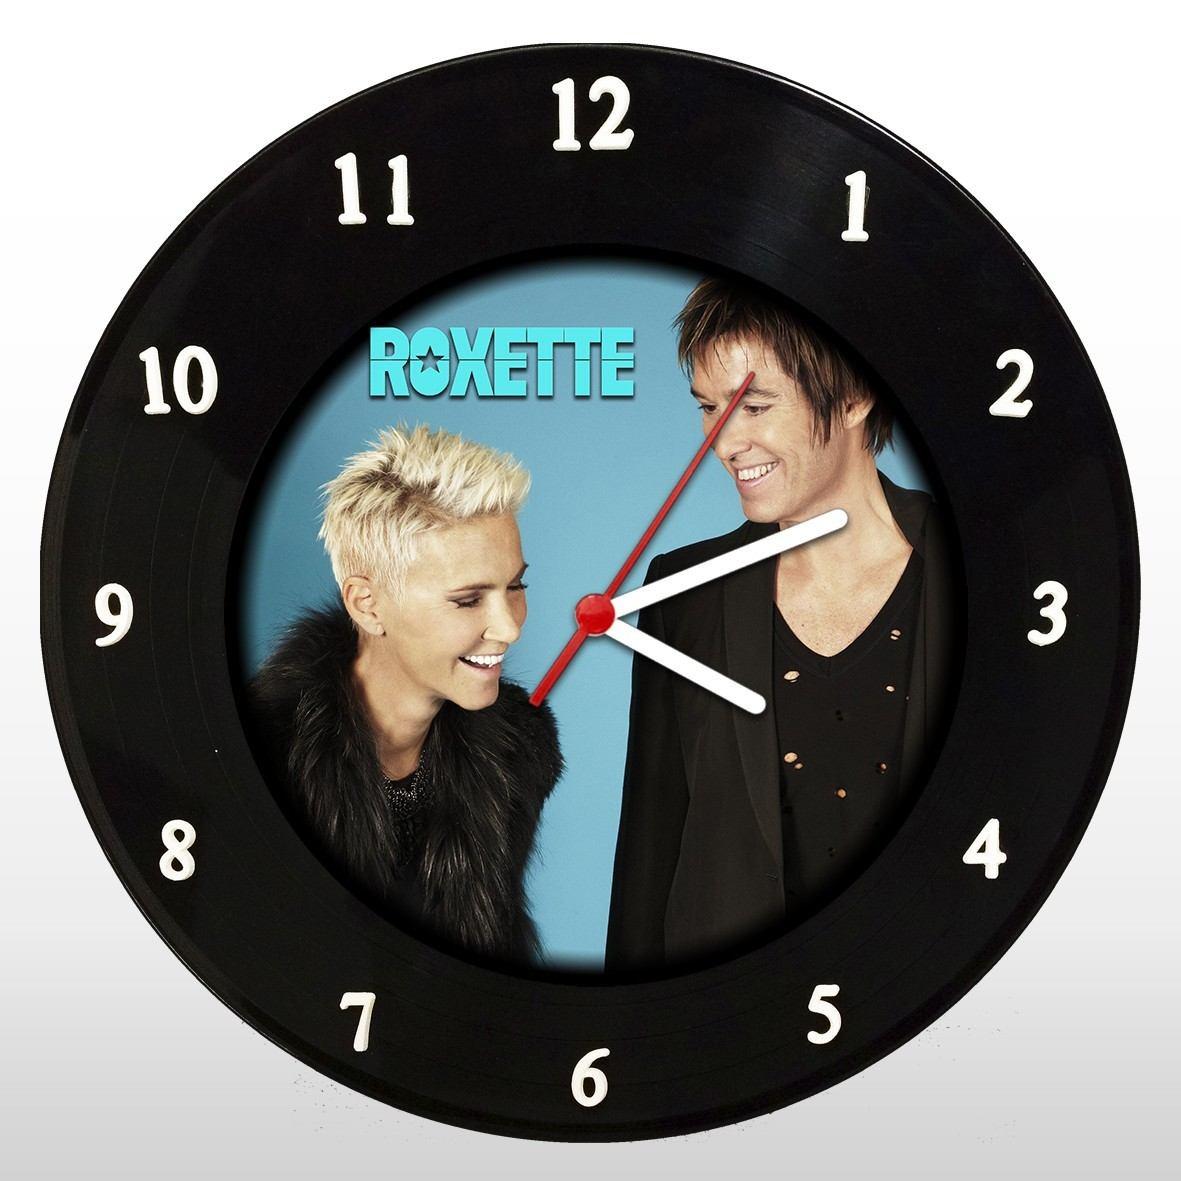 Roxette - Relógio de Parede em Disco de Vinil - Mr. Rock